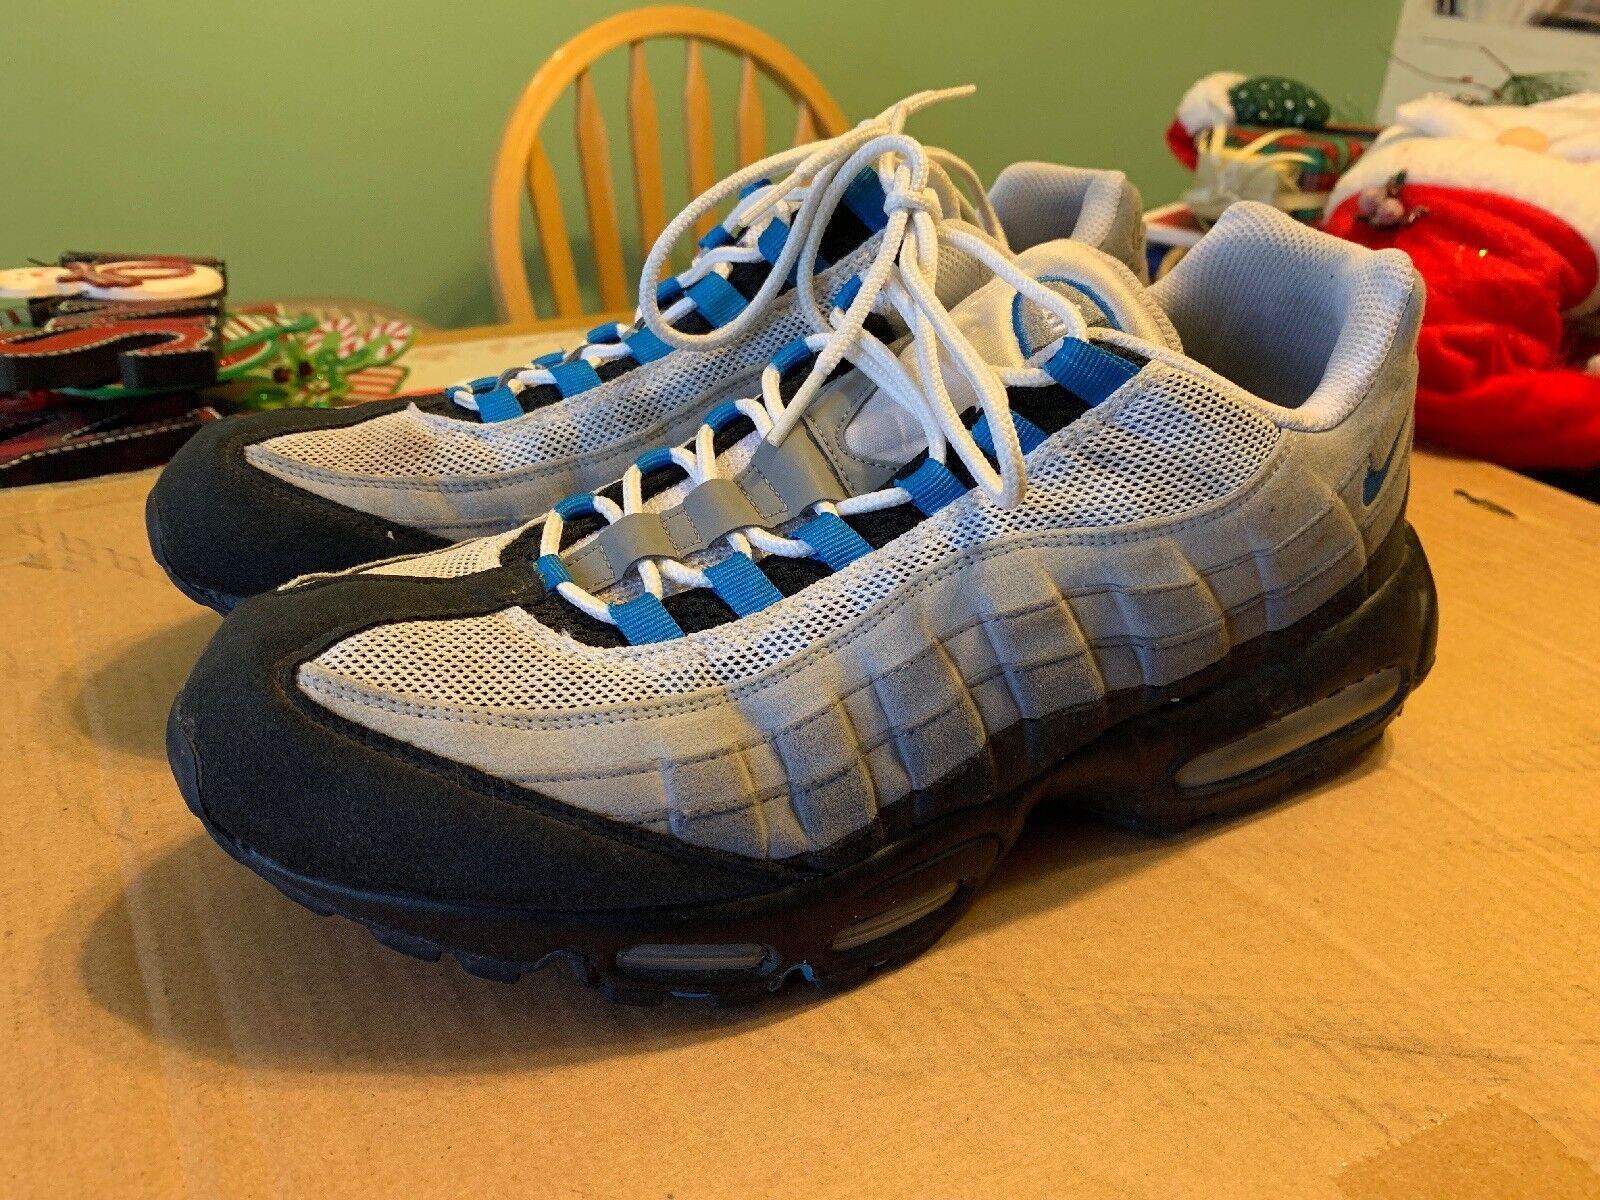 Nike Air Max 95 Cool Grey Photo bluee Black Black Black White Mens Size 13 609048-034 2010 63f375